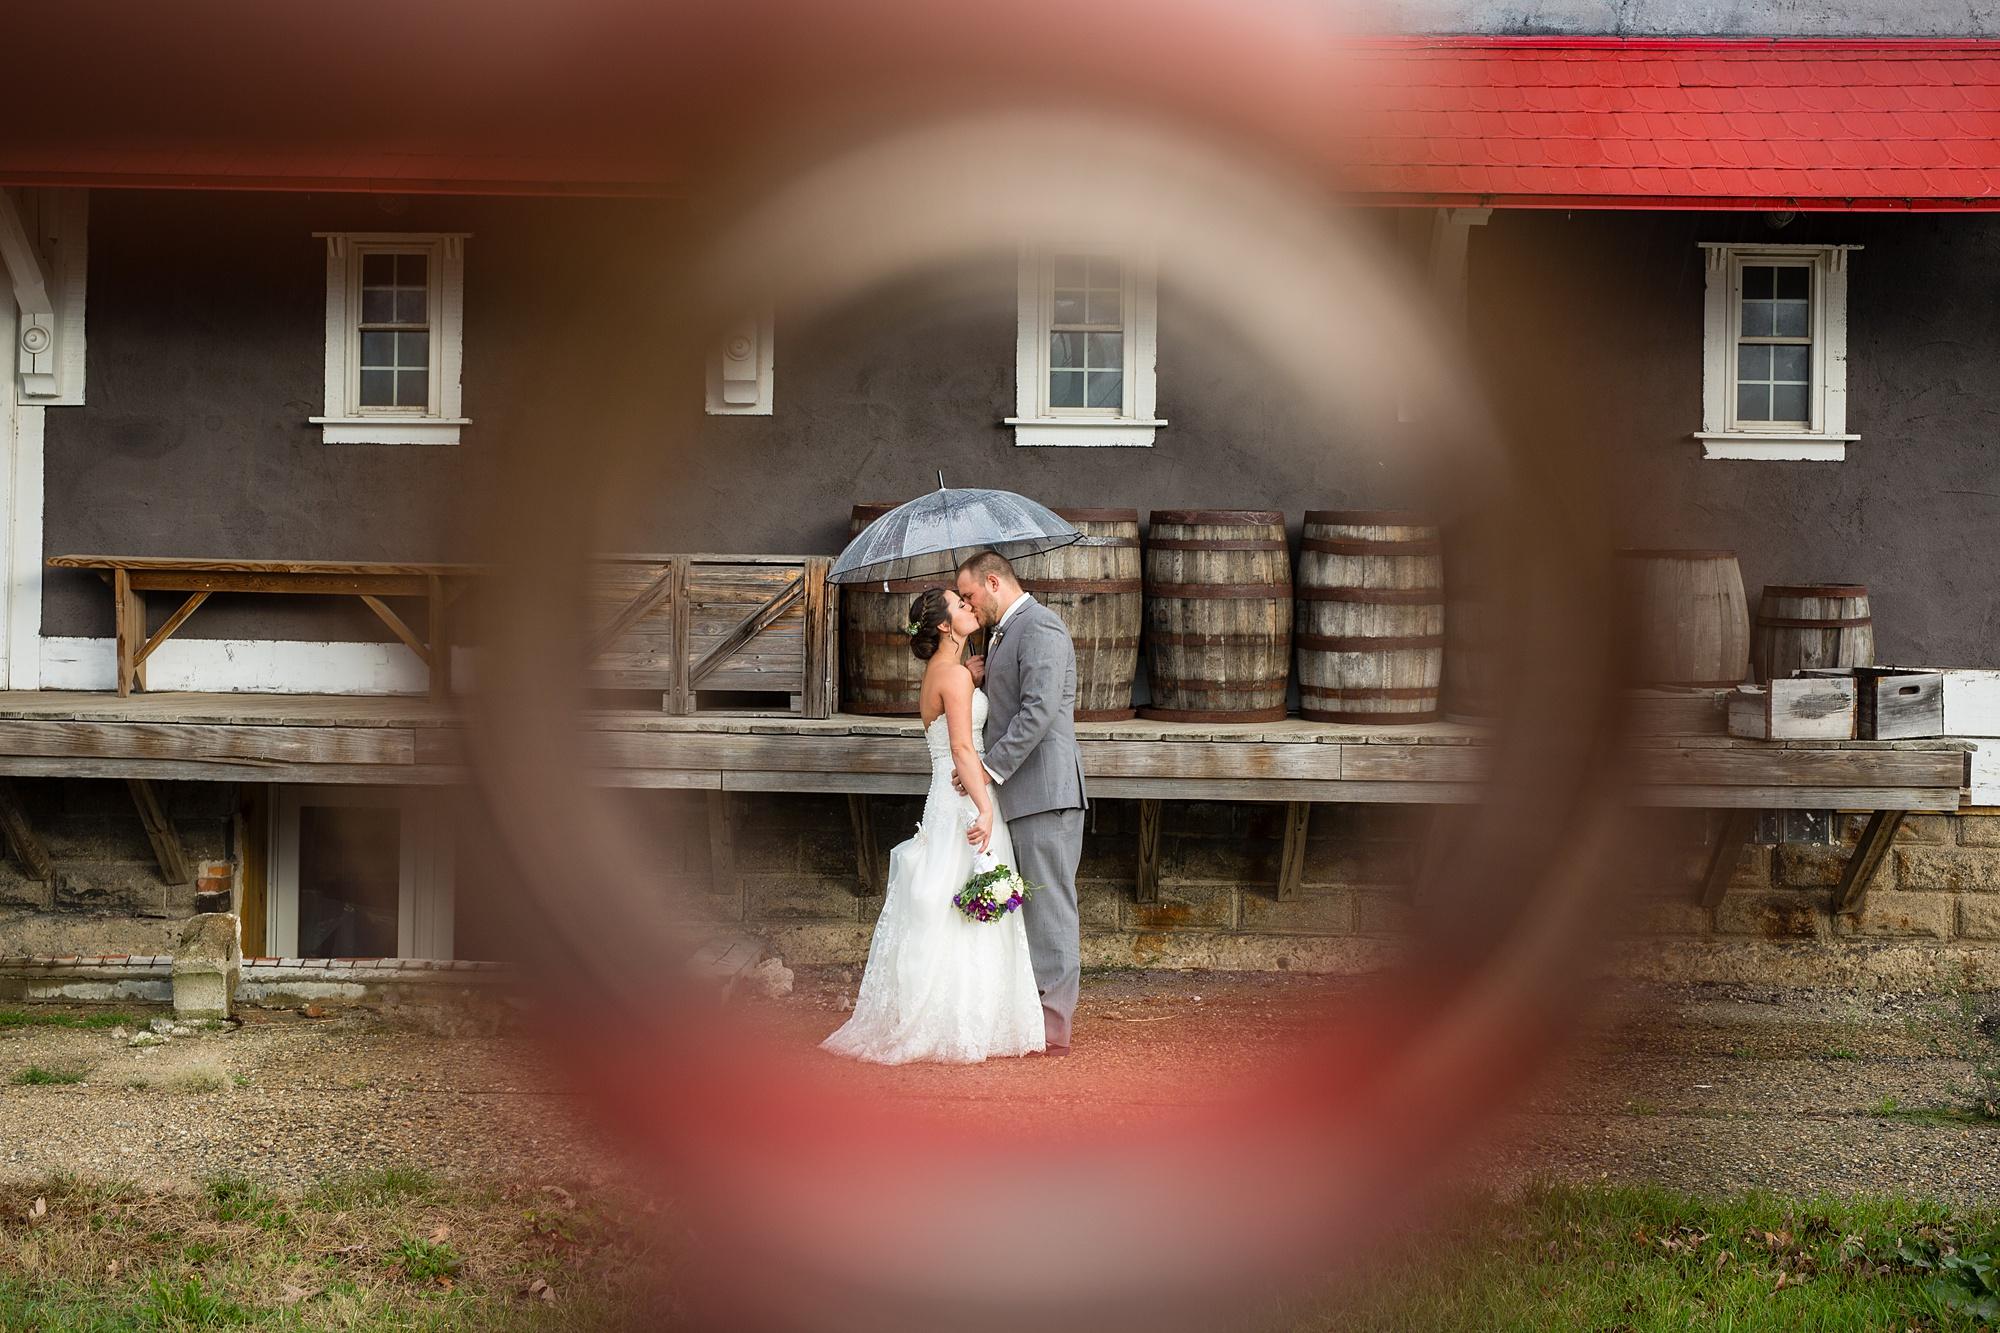 Brandon_Shafer_Photography_Emily_Travis_Kalamazoo_Wedding_Photography_0038.jpg